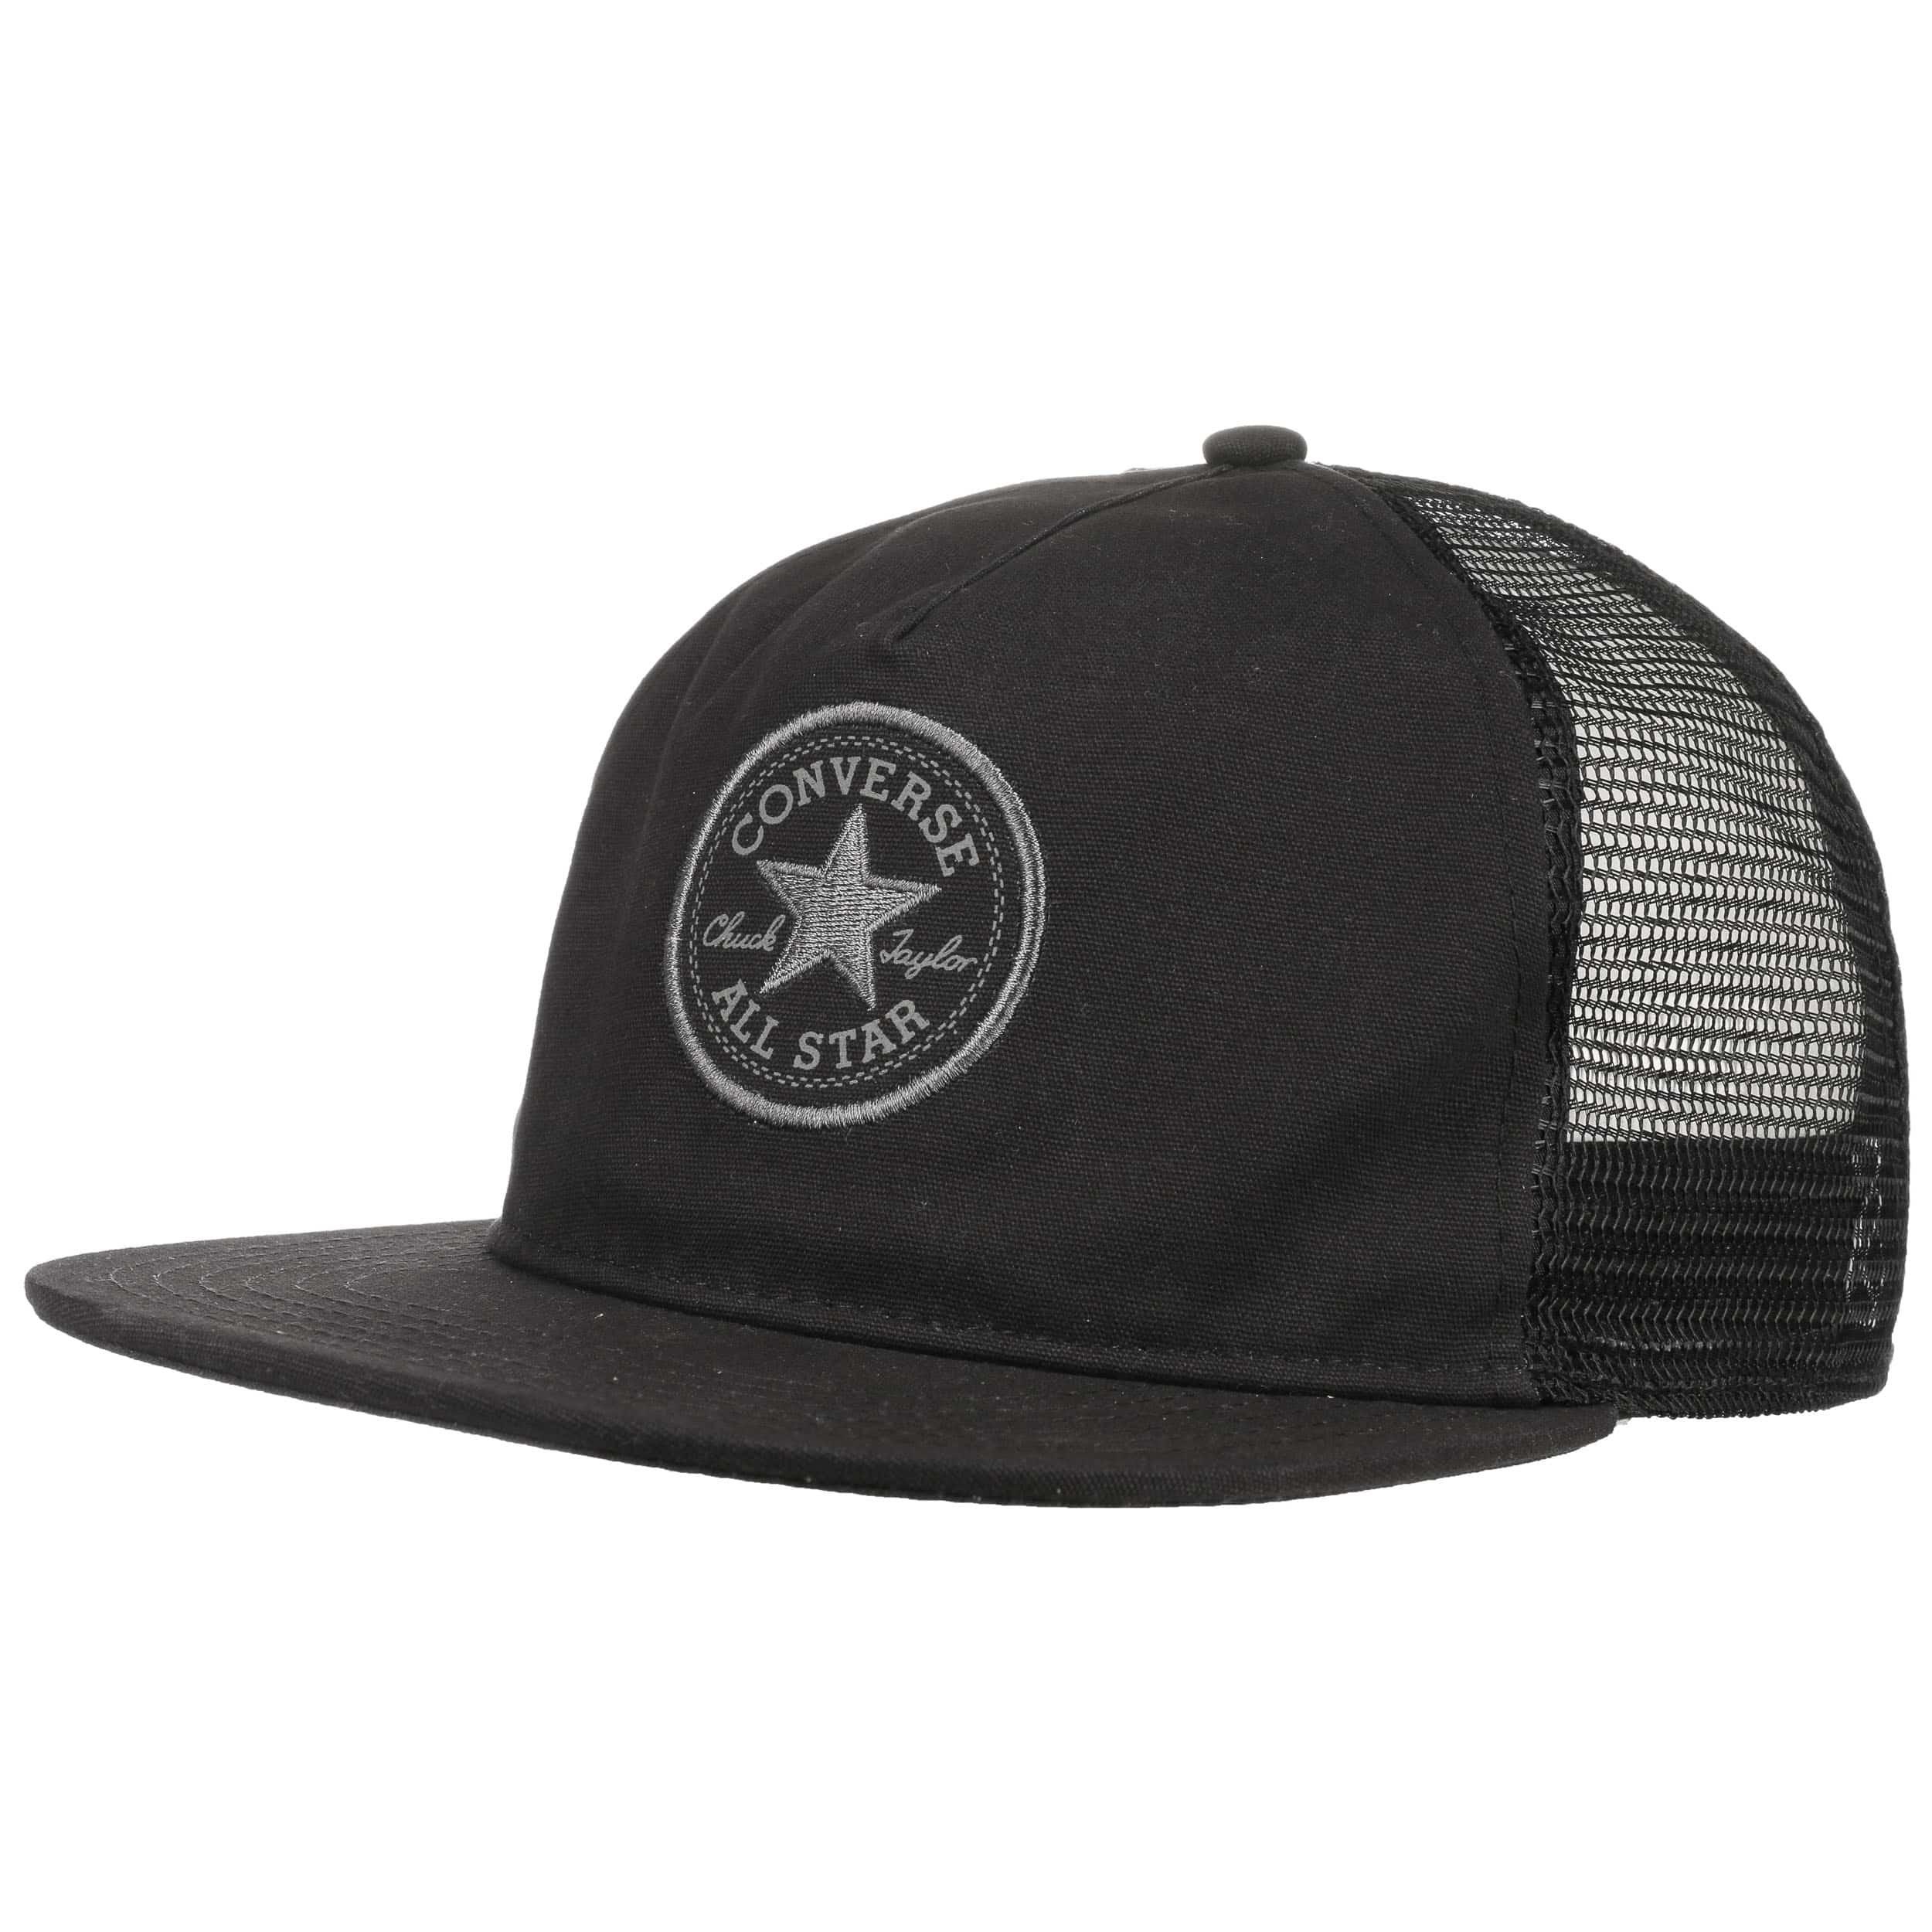 converse trucker cap